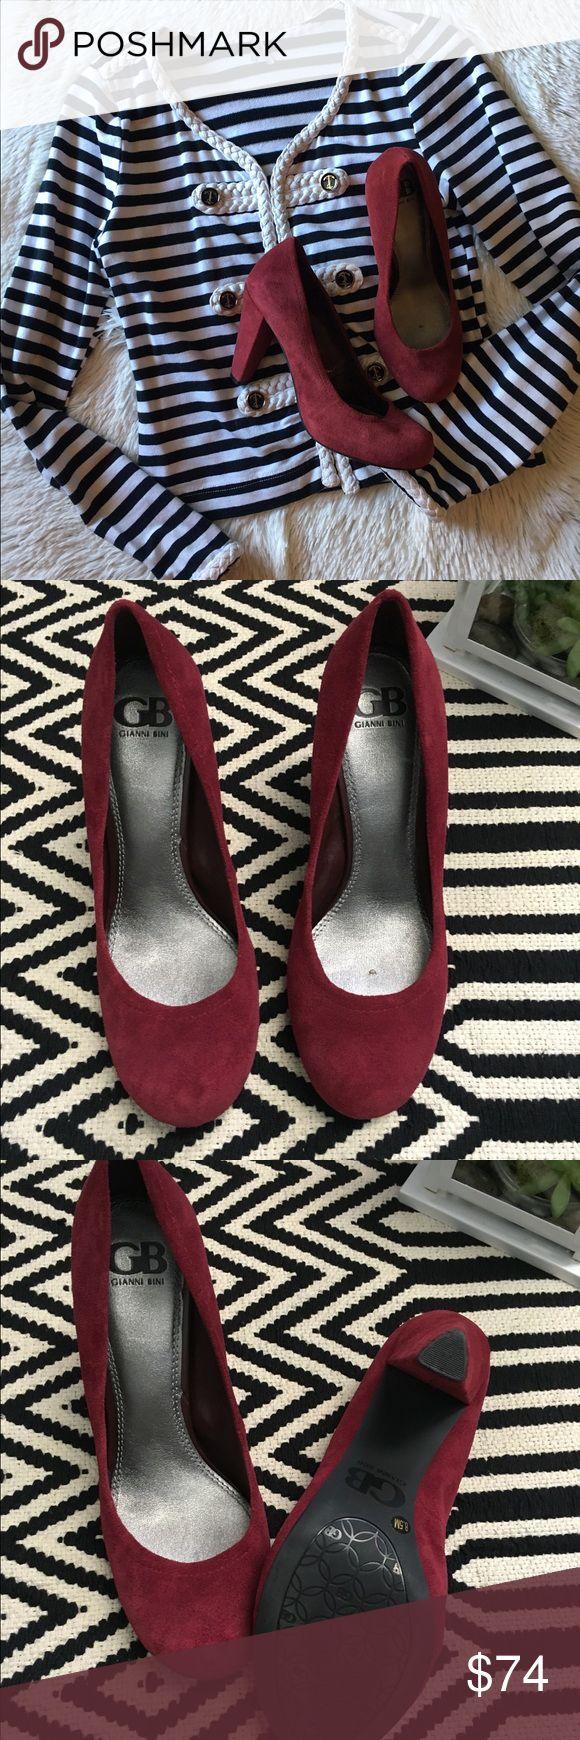 Gianni Bini burgundy suede pumps Like new condition. Gianni Bini burgundy suede pumps. Size 8.5M Gianni Bini Shoes Heels